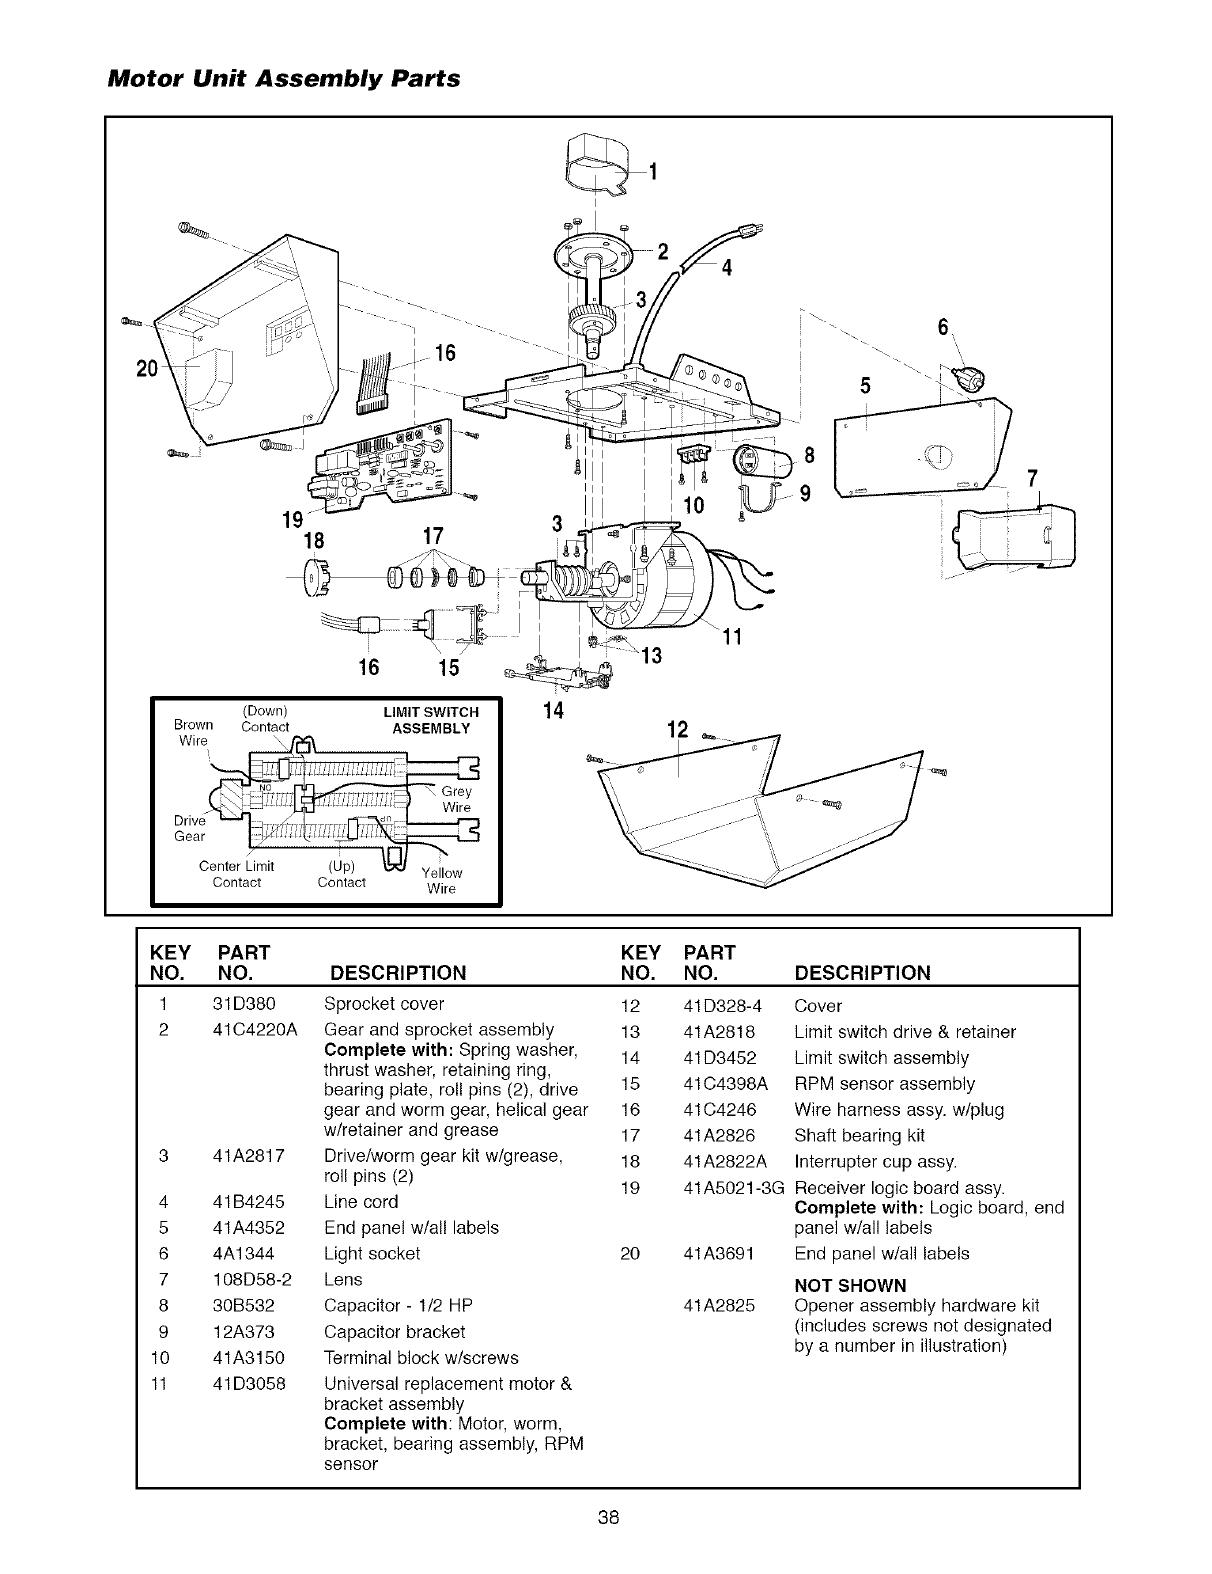 Wiring Small Garage Circuit Pt 1 Of 2 Manual Guide